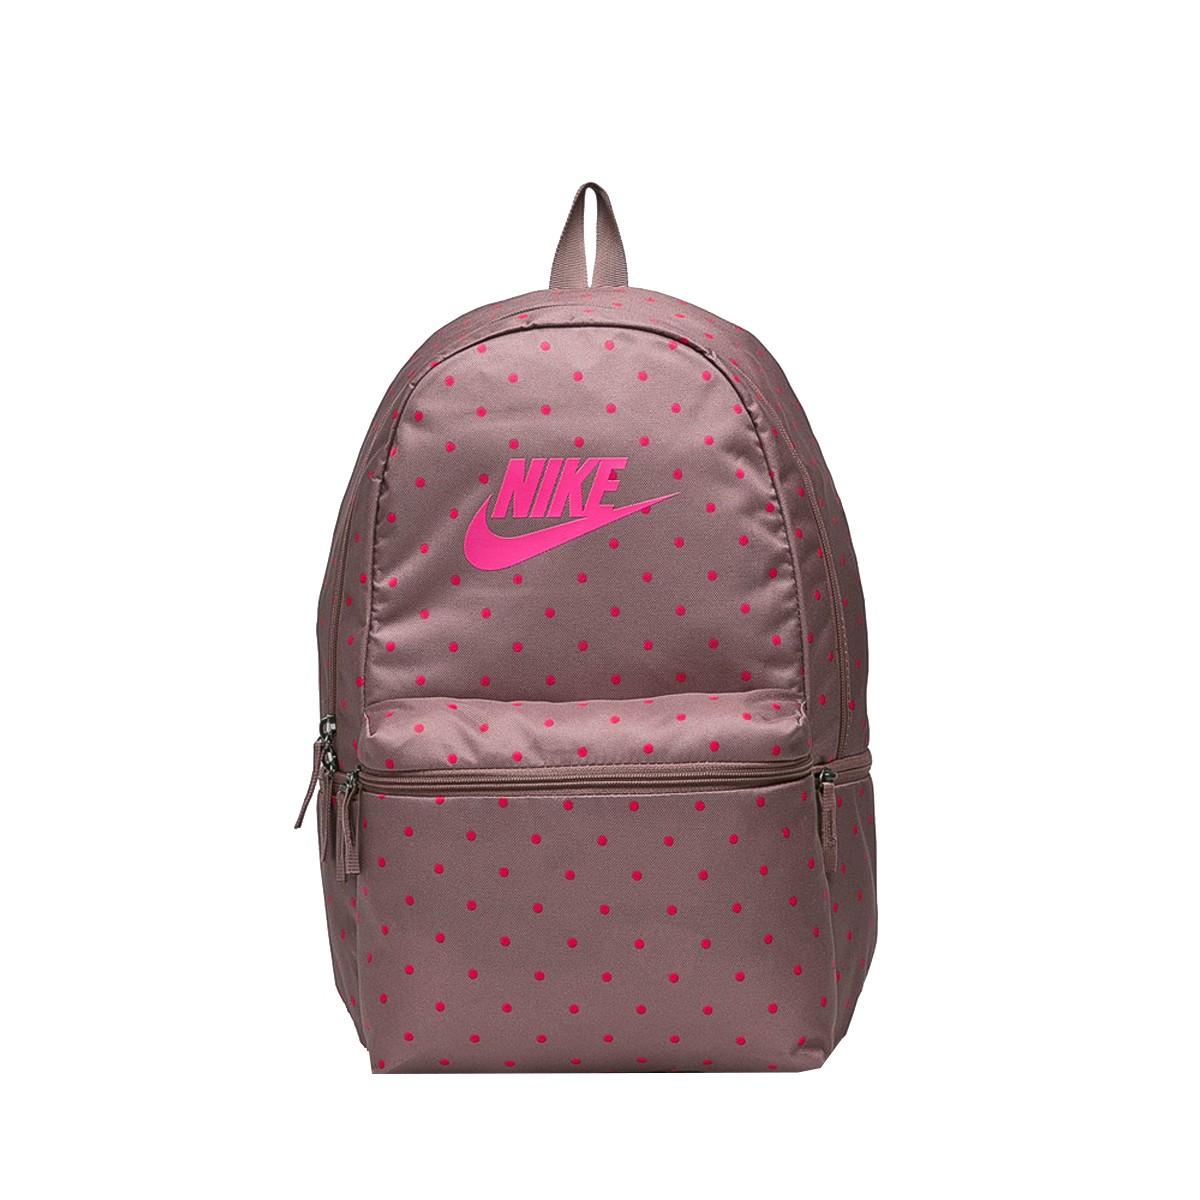 689e1cebb4 NIKE NIKE ruksak NK HERITAGE BKPK - AOP BA5761-259 - Jeftinije.hr